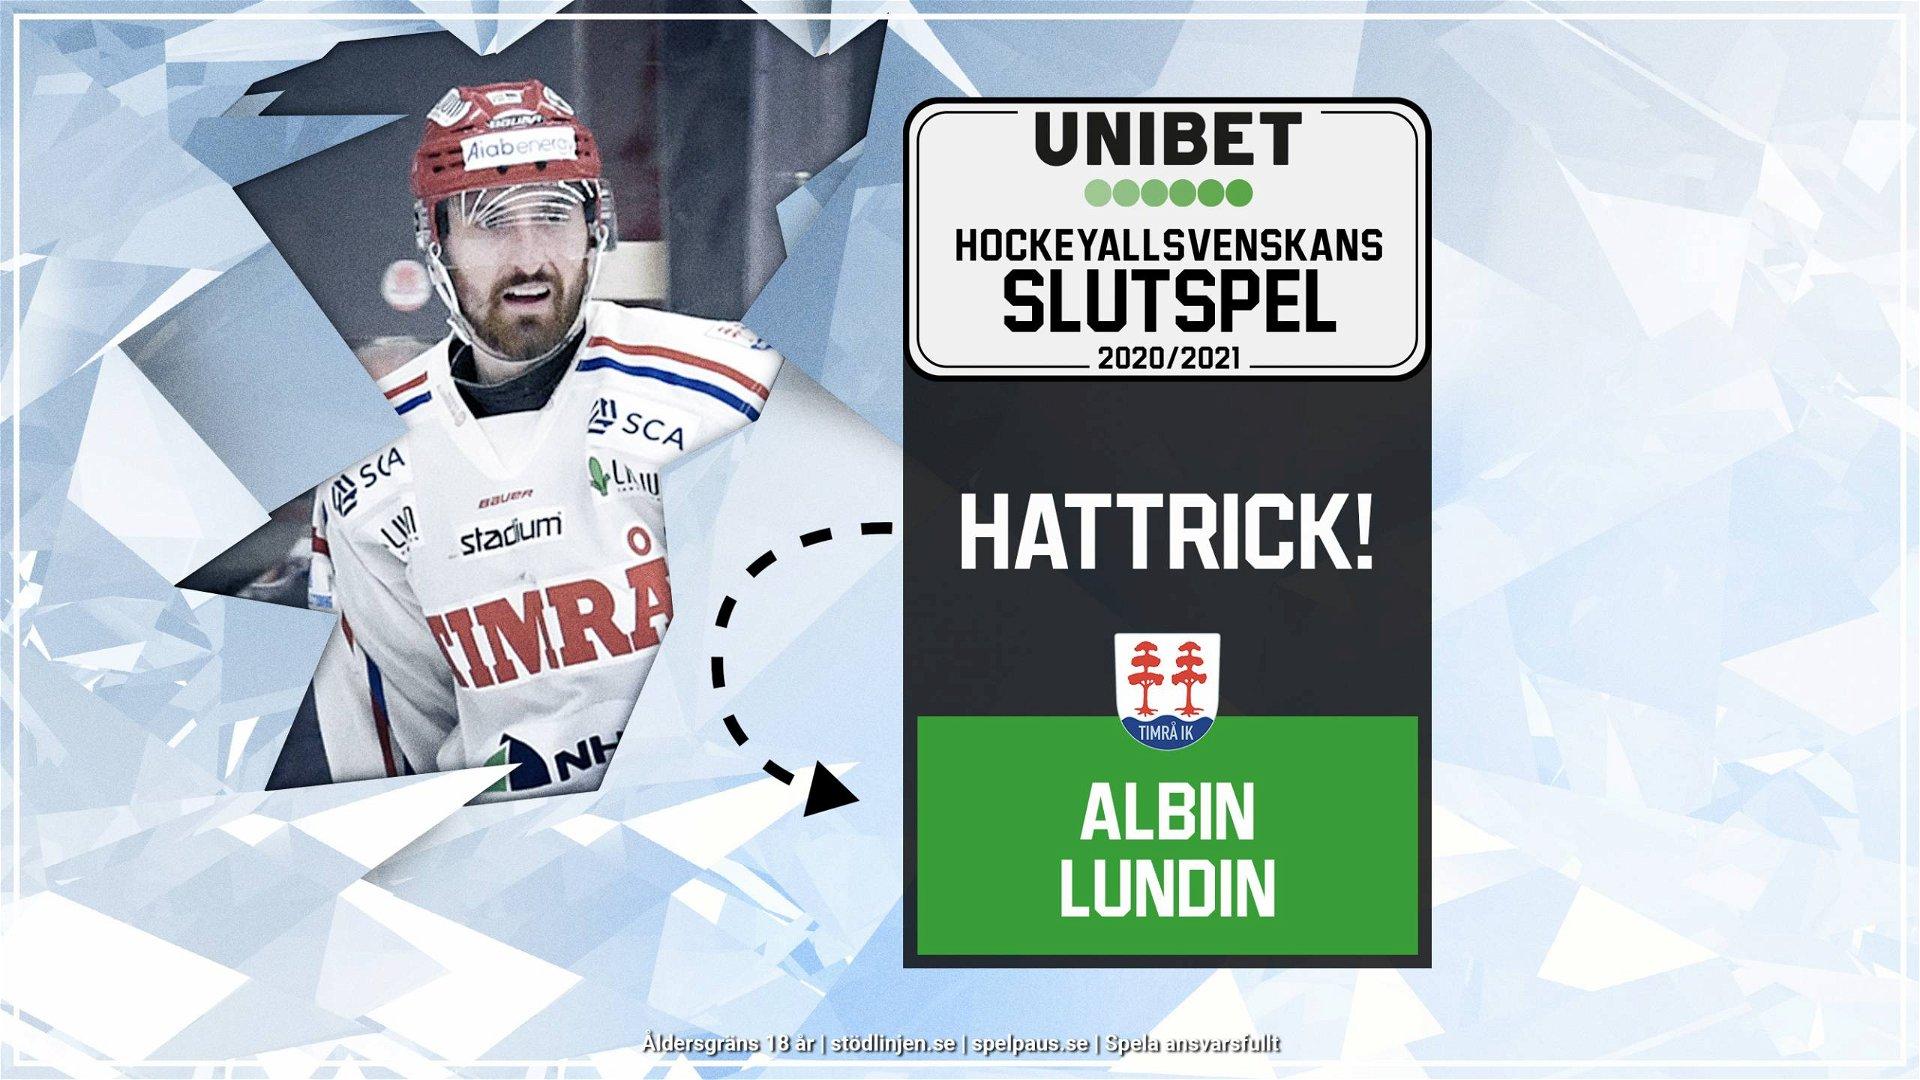 Hattrick: Albin Lundin, Timrå